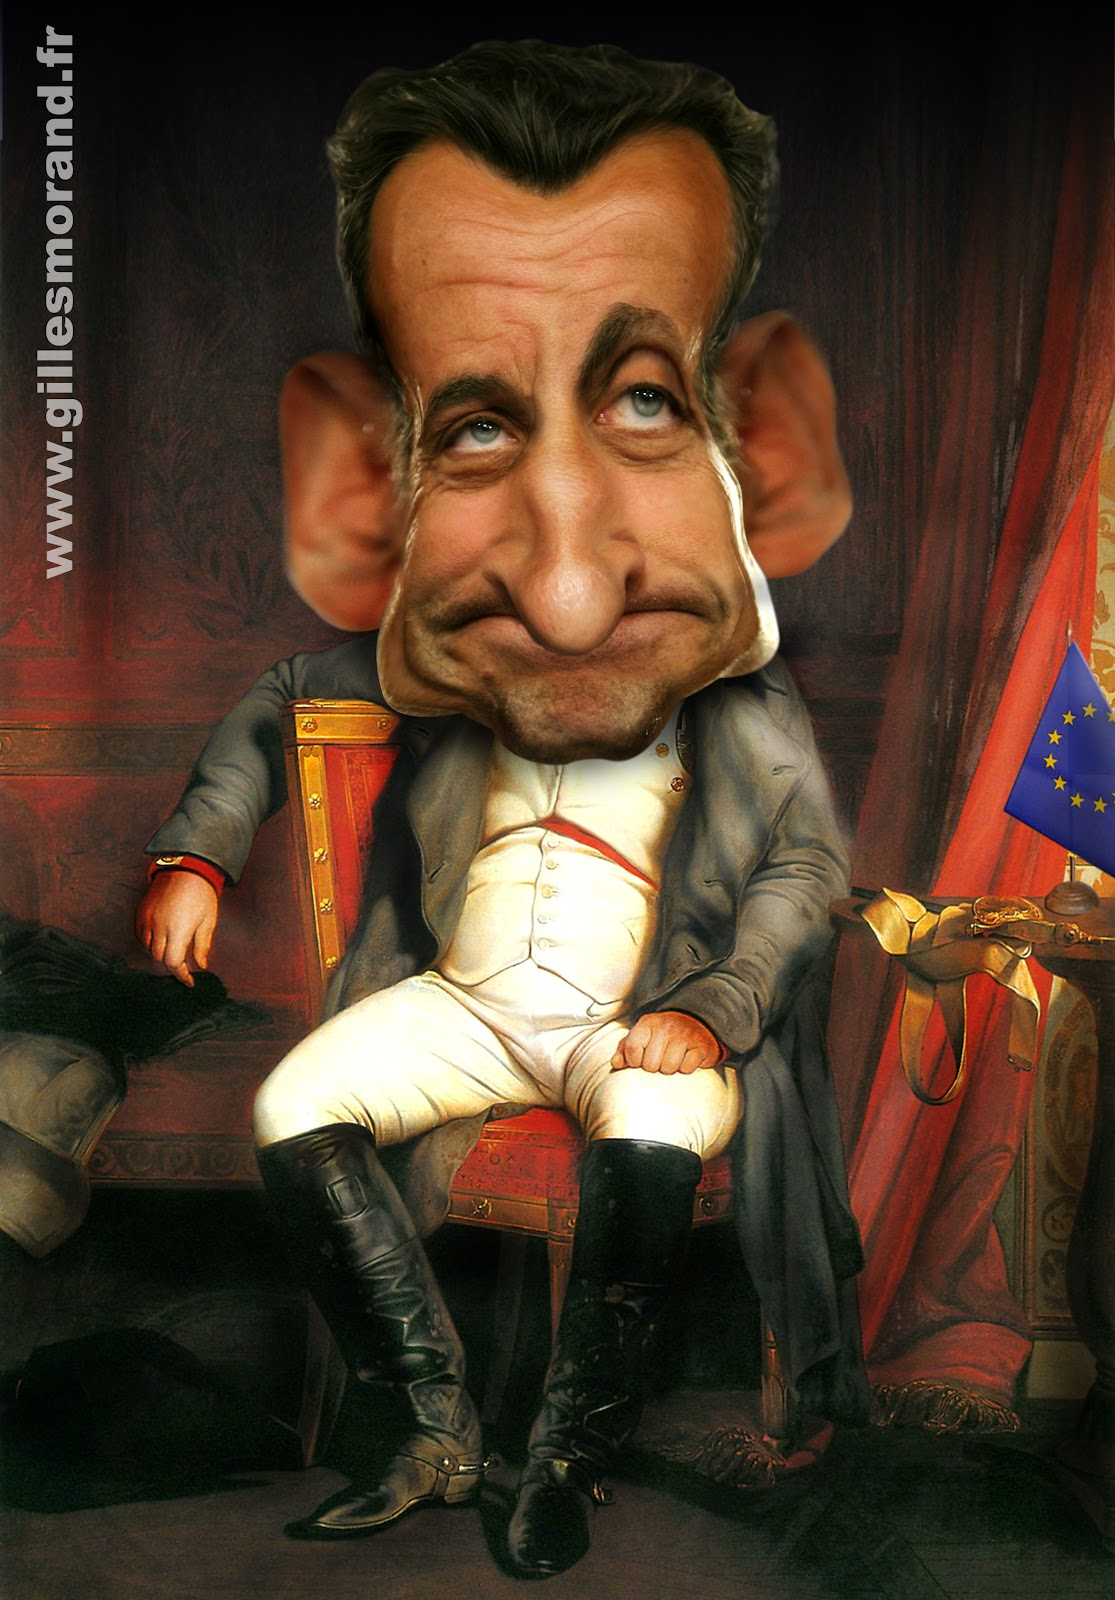 http://2.bp.blogspot.com/-8RoEXB1jHoM/TwBcXW_OU_I/AAAAAAAAAqU/wq2iZePnj2k/s1600/caricature_sarkozy_st_helene.jpg